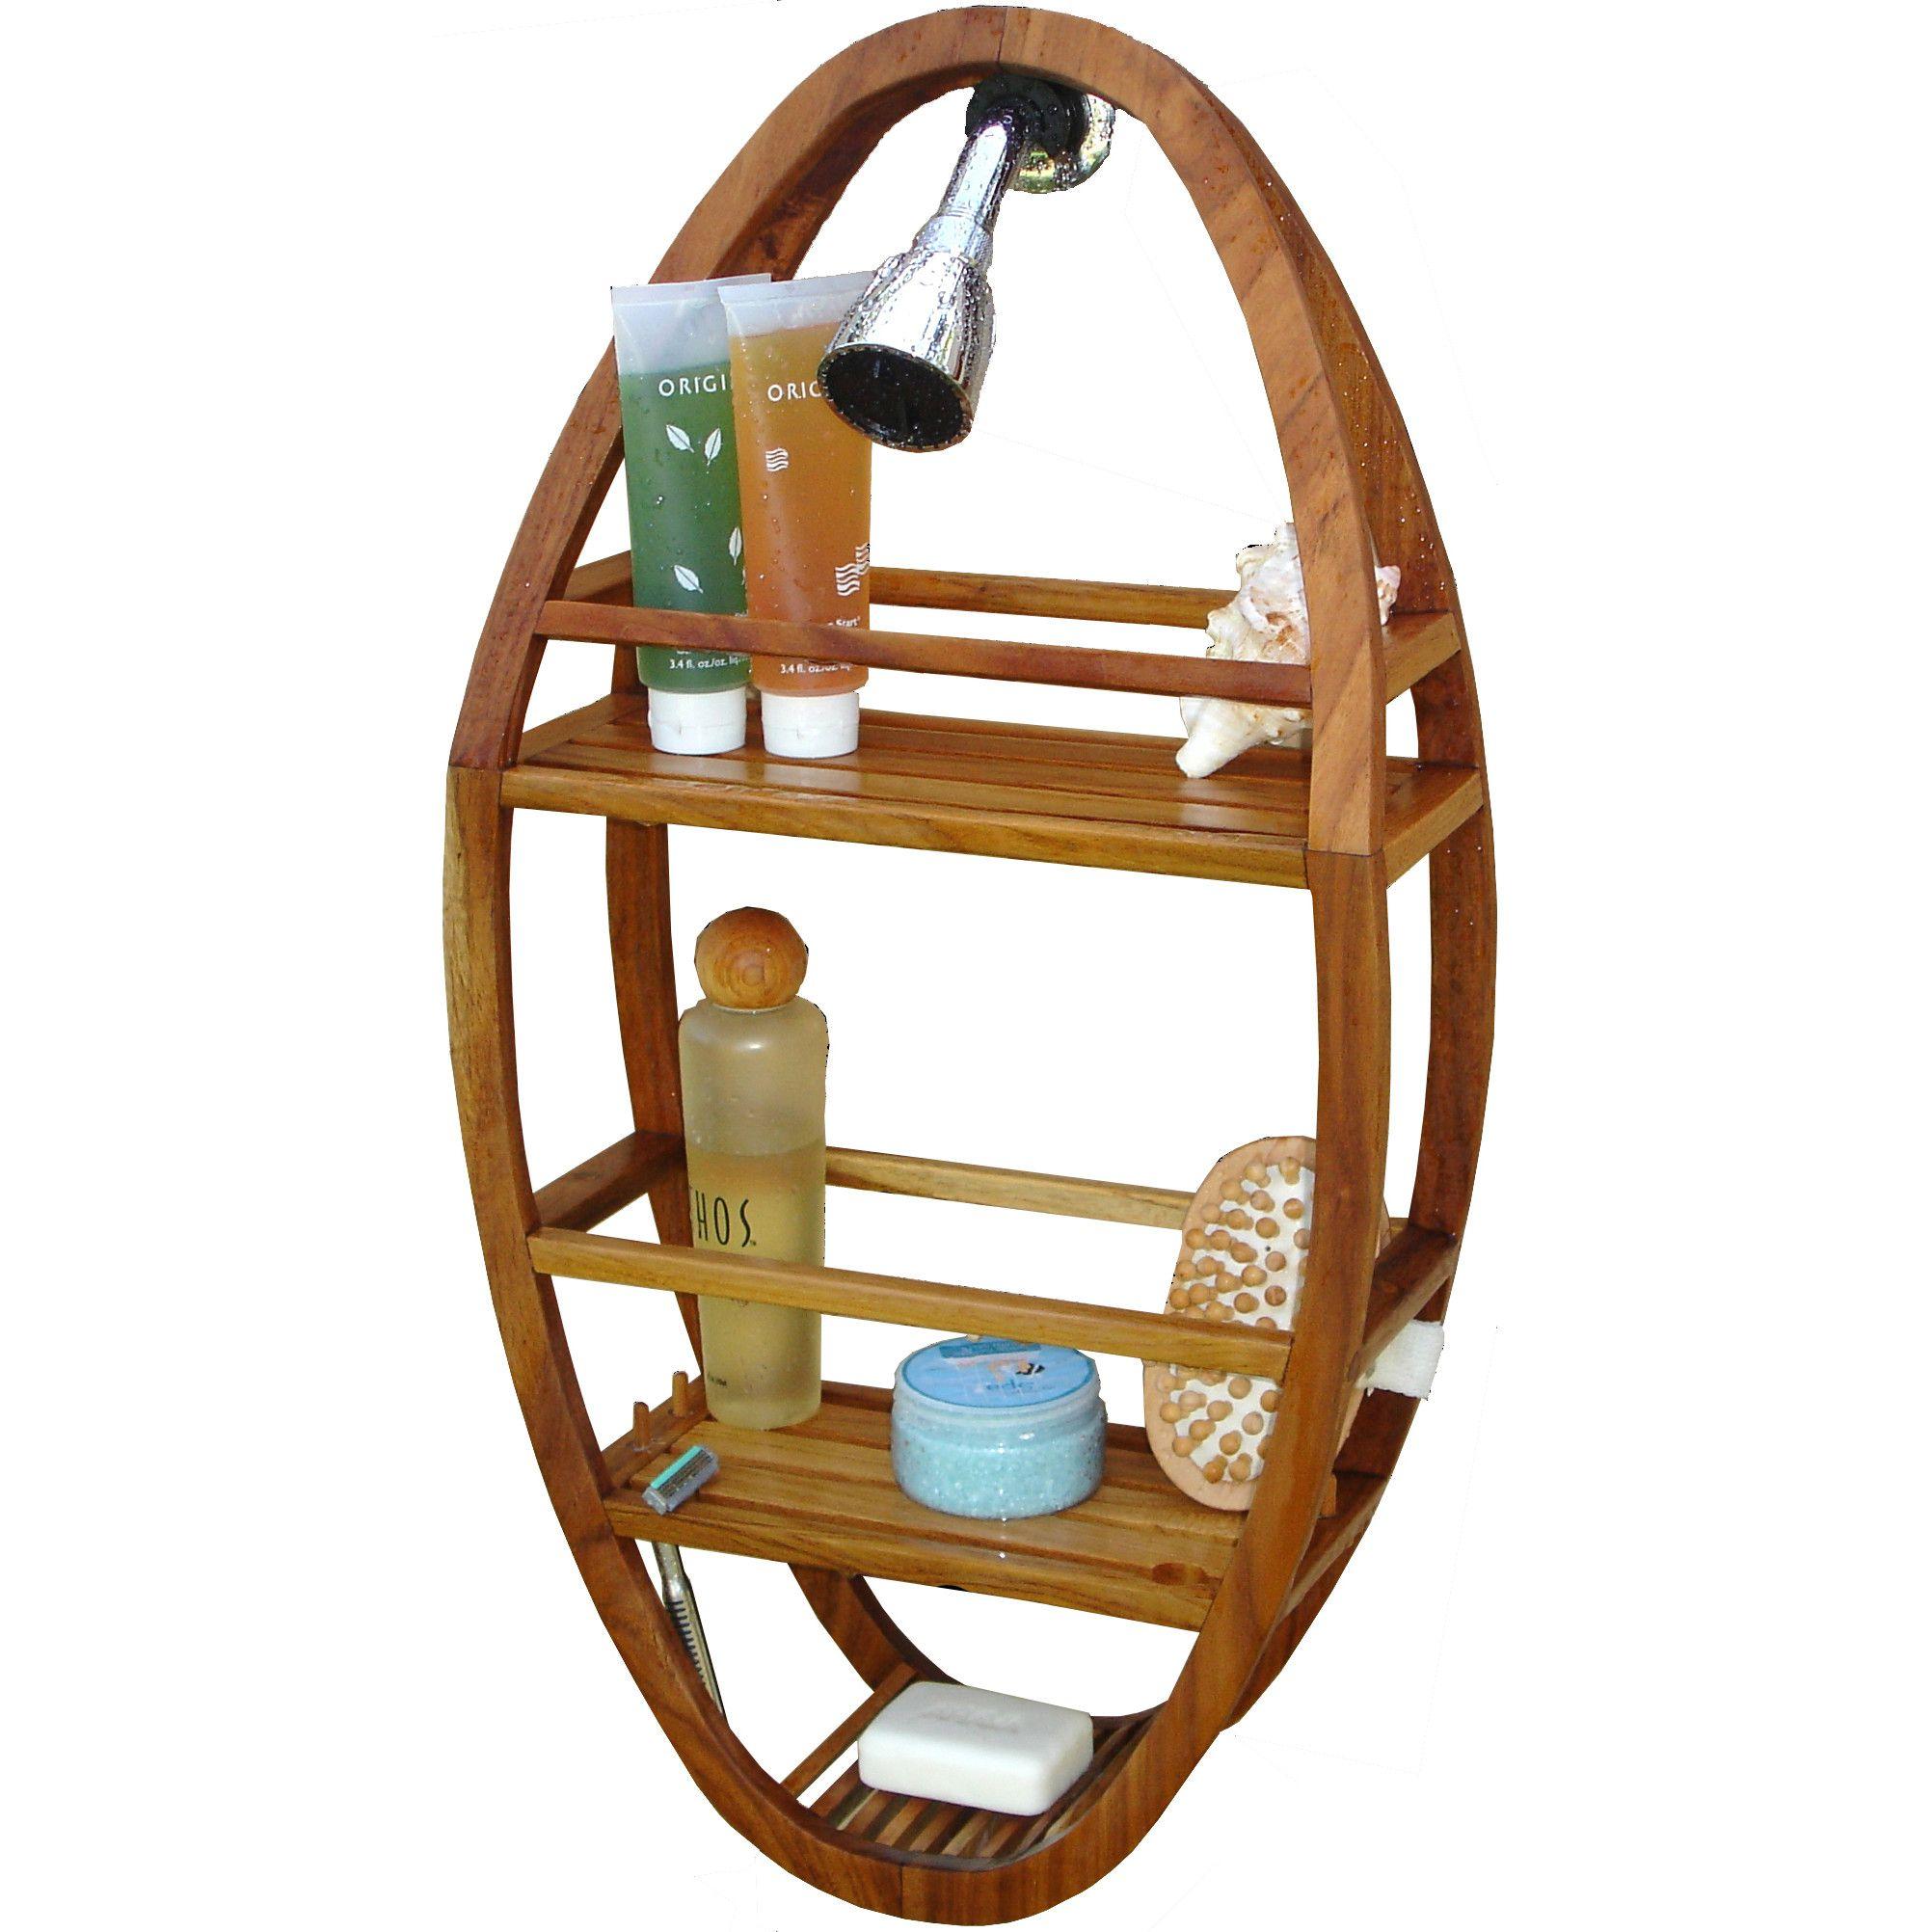 Teak Spa Teak Oval Shower Organizer, ideal for a \